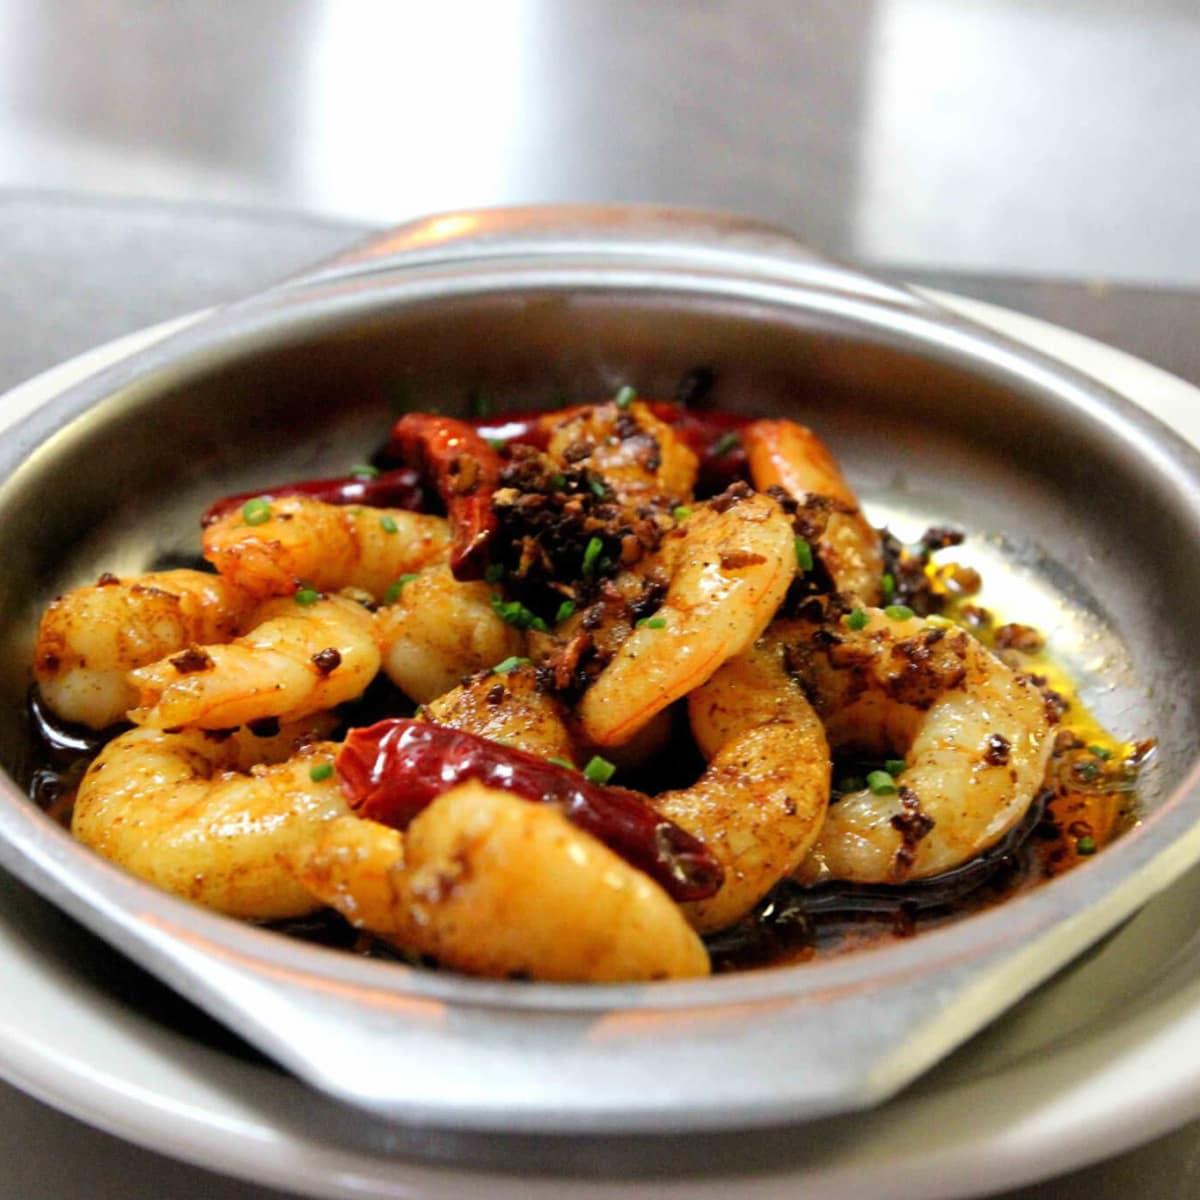 Cafe madrid shrimp dish